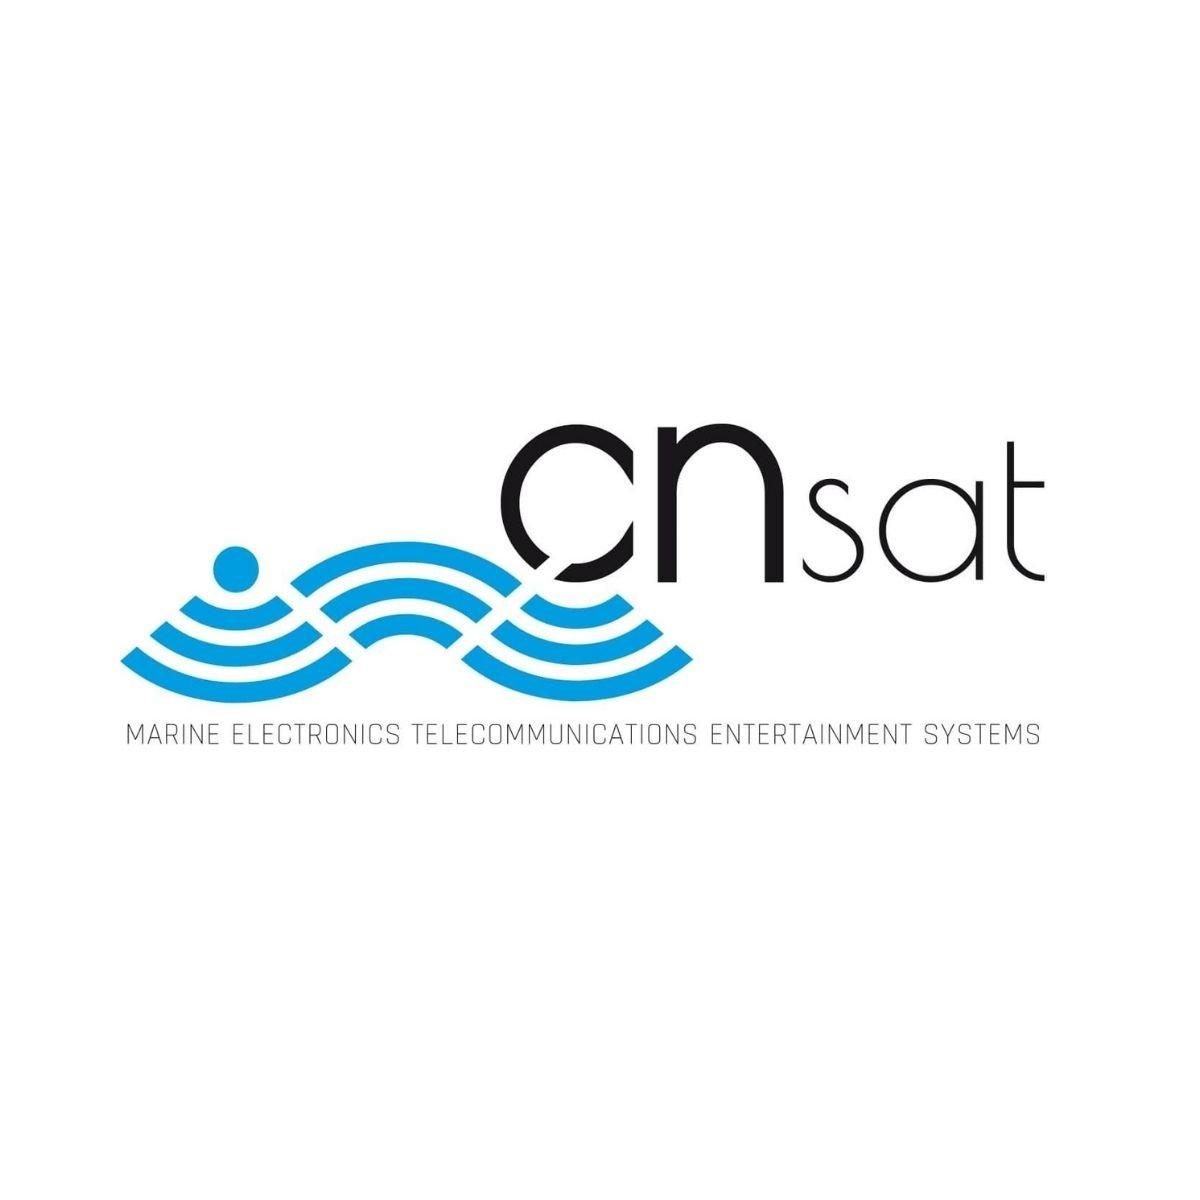 CNSAT marine electronics entertainment